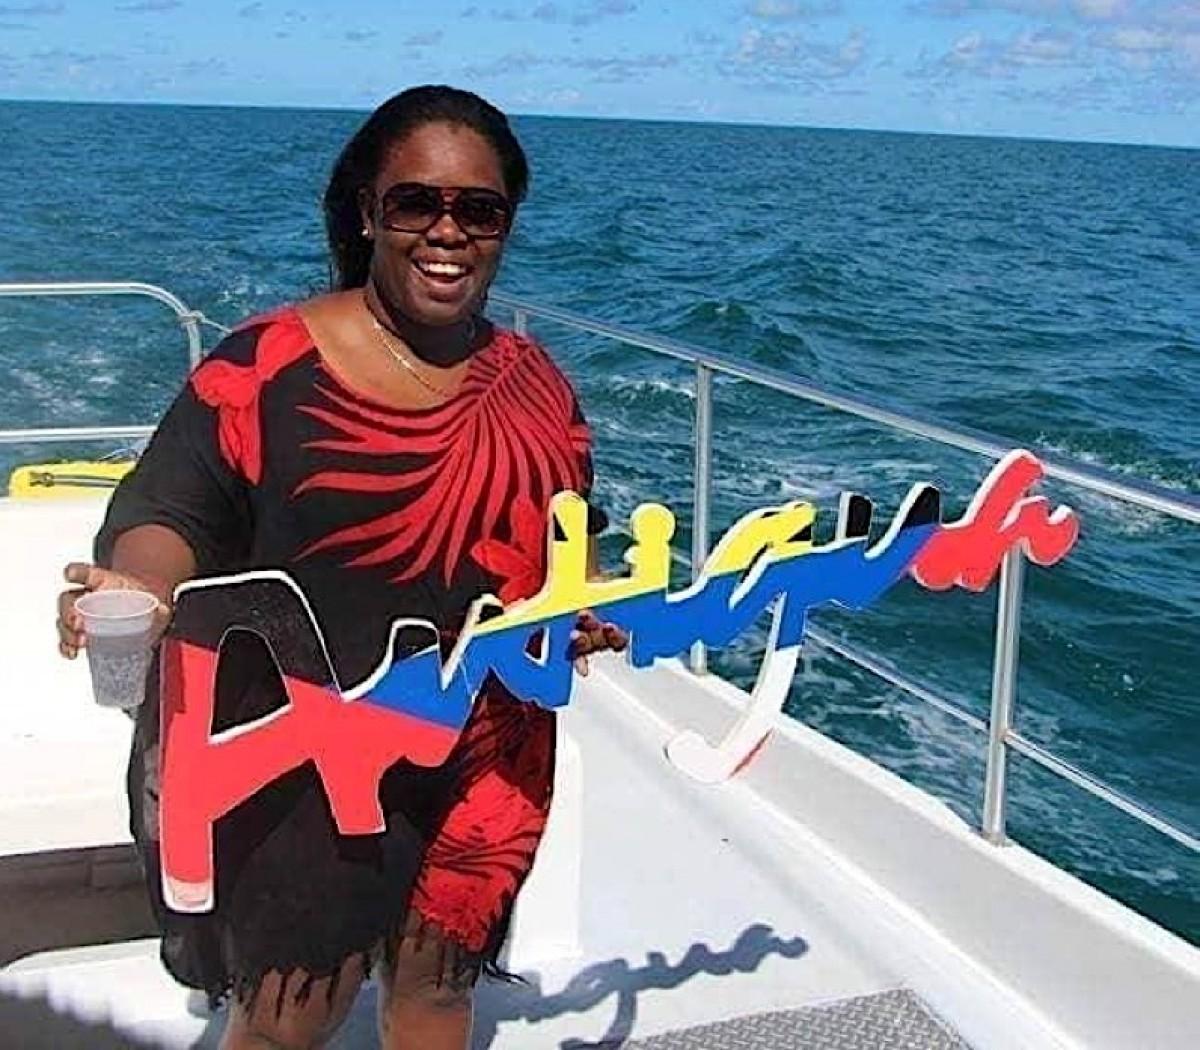 PAX checks in with Antigua & Barbuda's Tameka Wharton